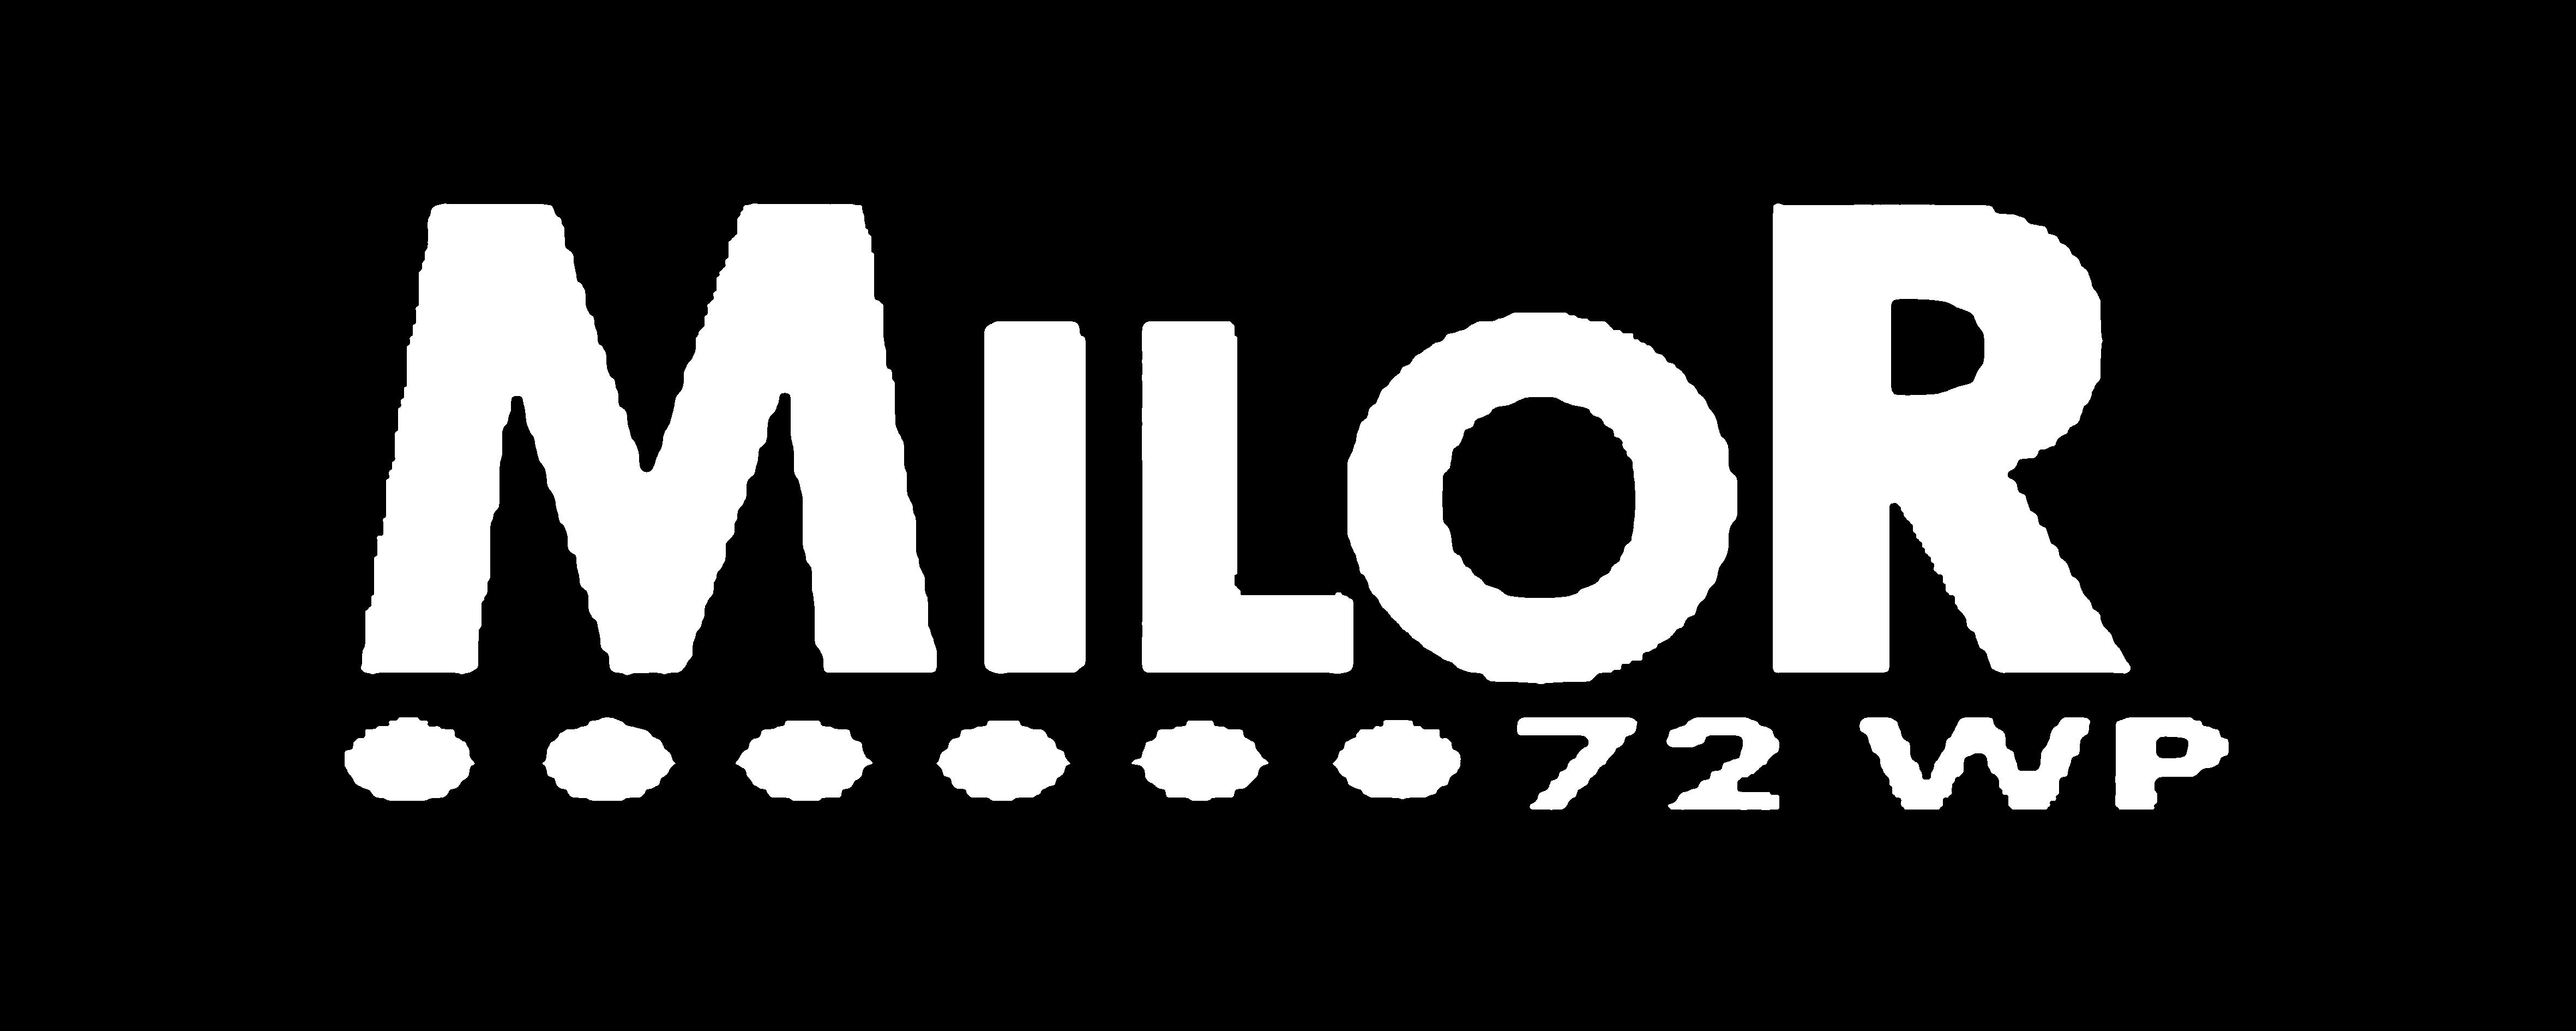 MILOR-72-WP